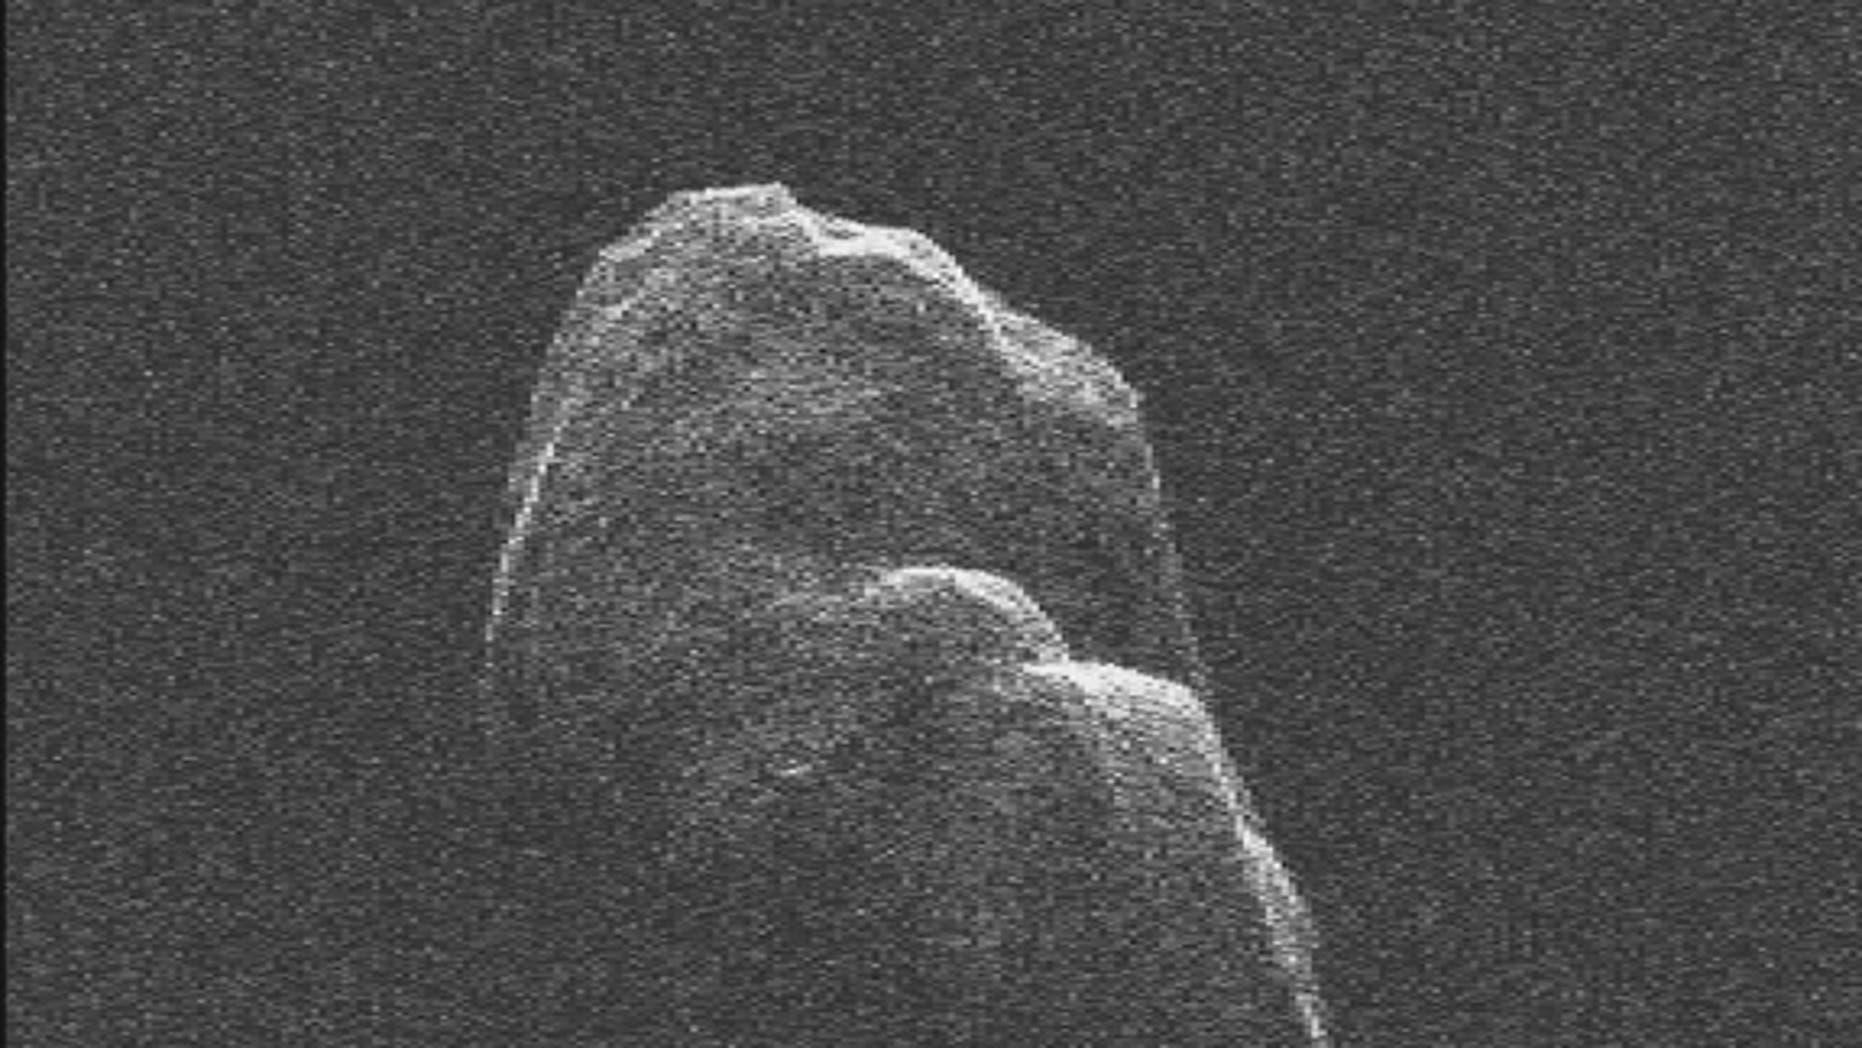 Radar imagery of asteroid Toutatis taken by NASA's Goldstone Solar System Radar on Dec. 12 and 13, 2012